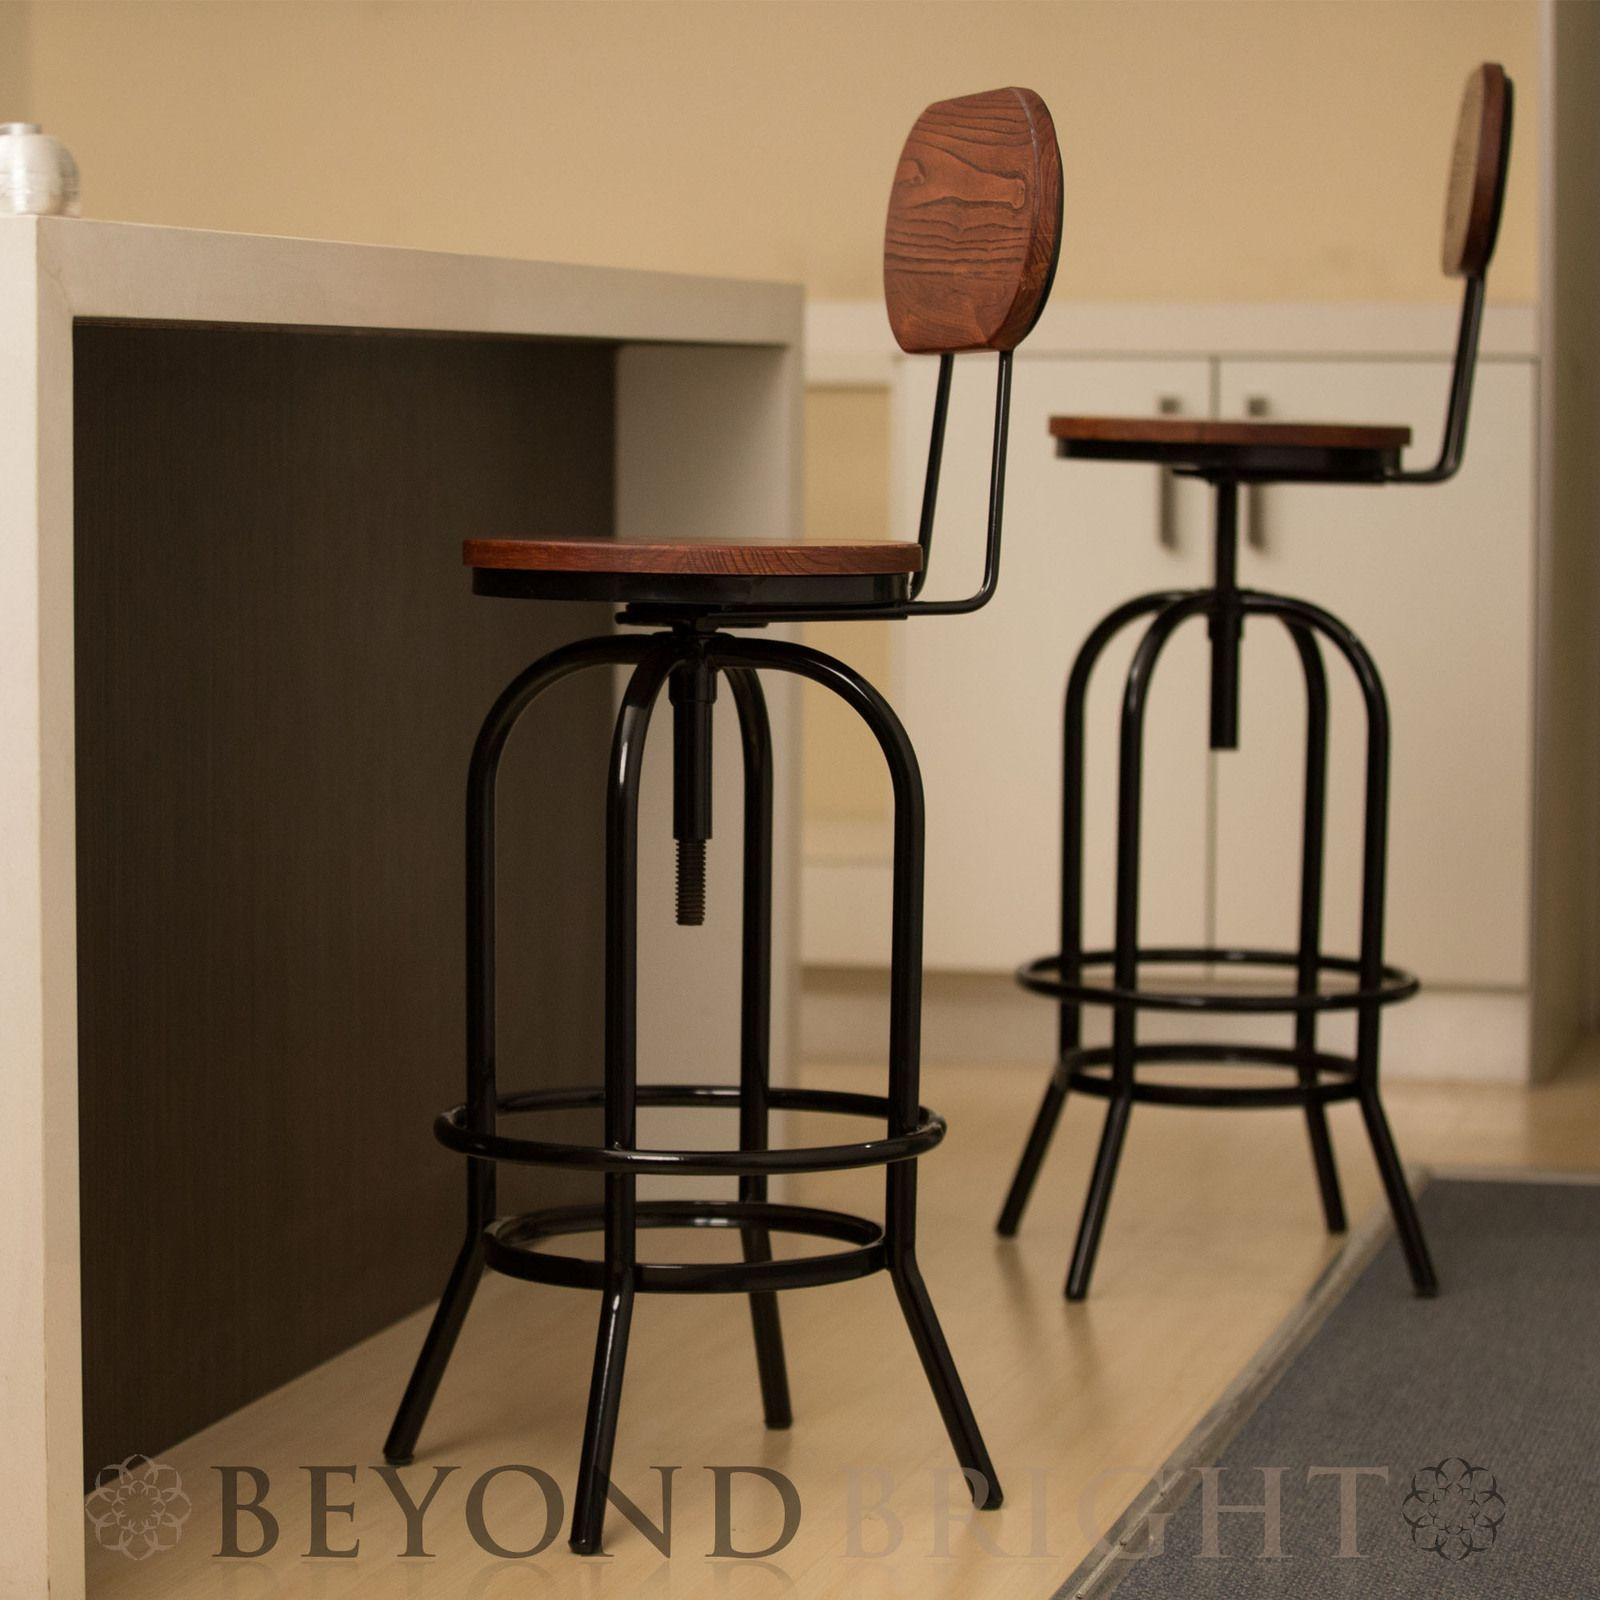 Brilliant 2 X Ari Bar Stool With Back Black Bar Stools Bar Stools Caraccident5 Cool Chair Designs And Ideas Caraccident5Info